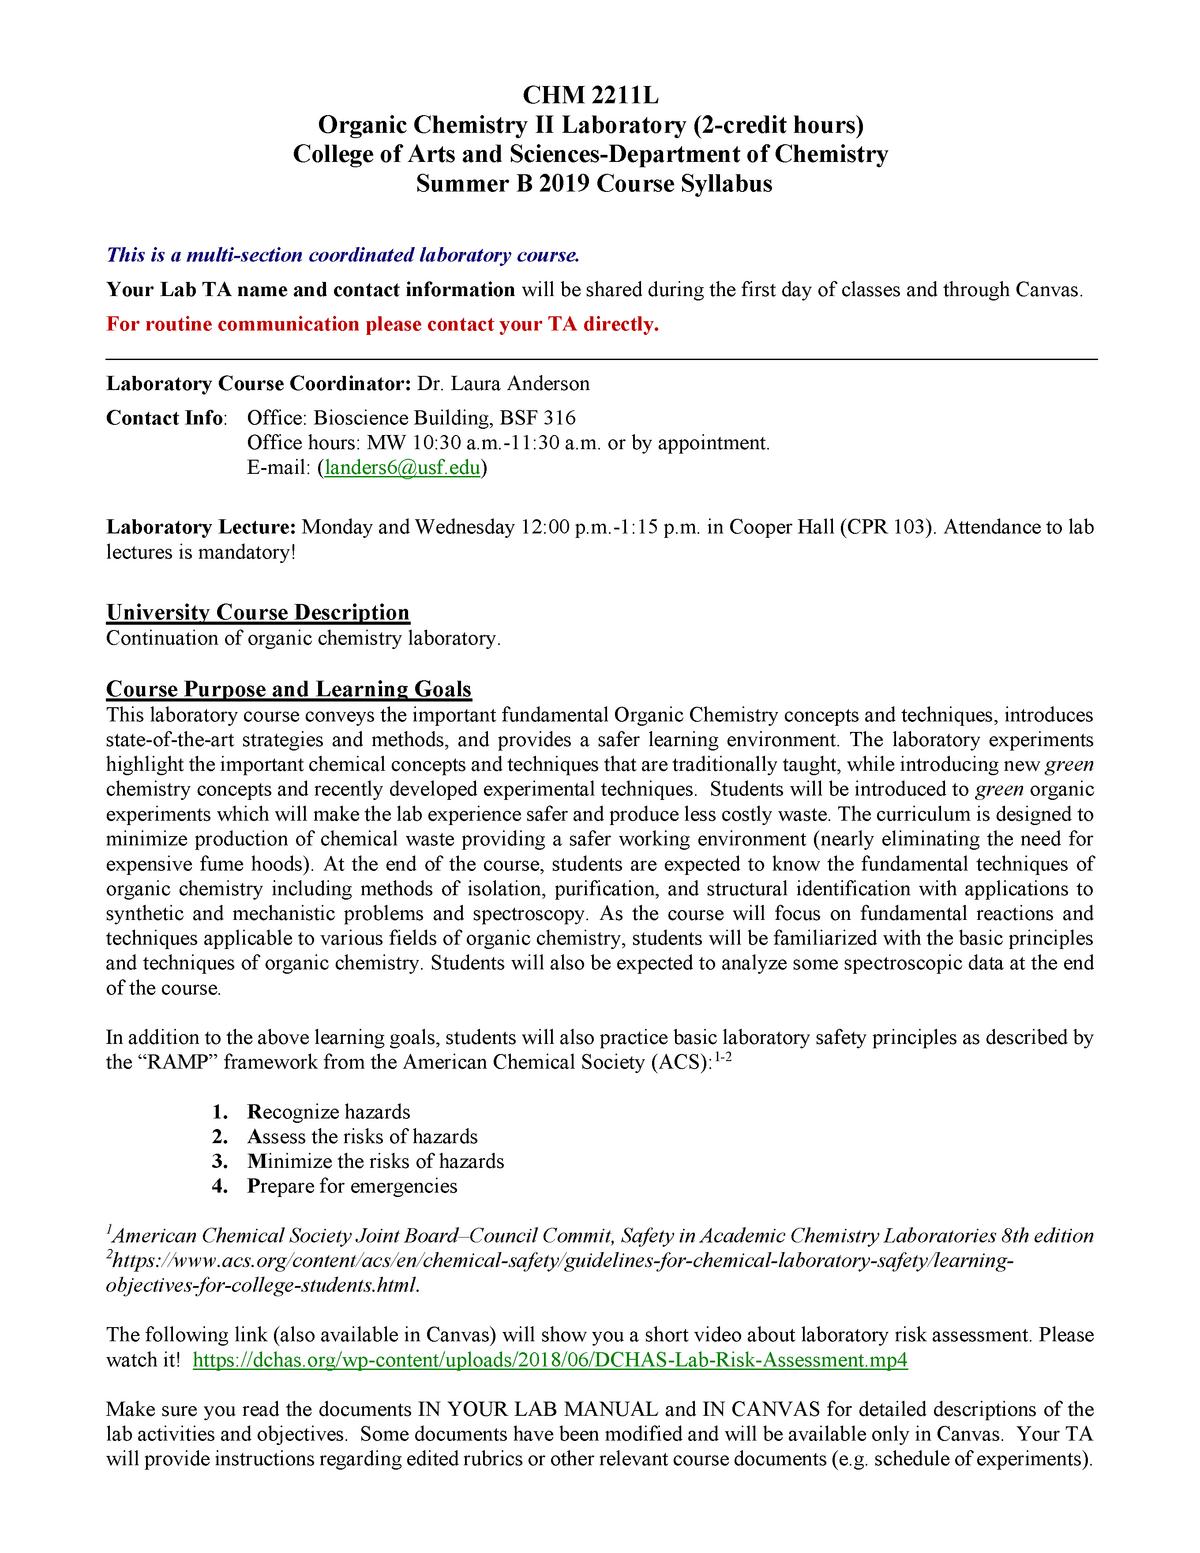 CHM 2211L- Syllabus SB 19 - CHM2211L: Organic Chemistry Laboratory